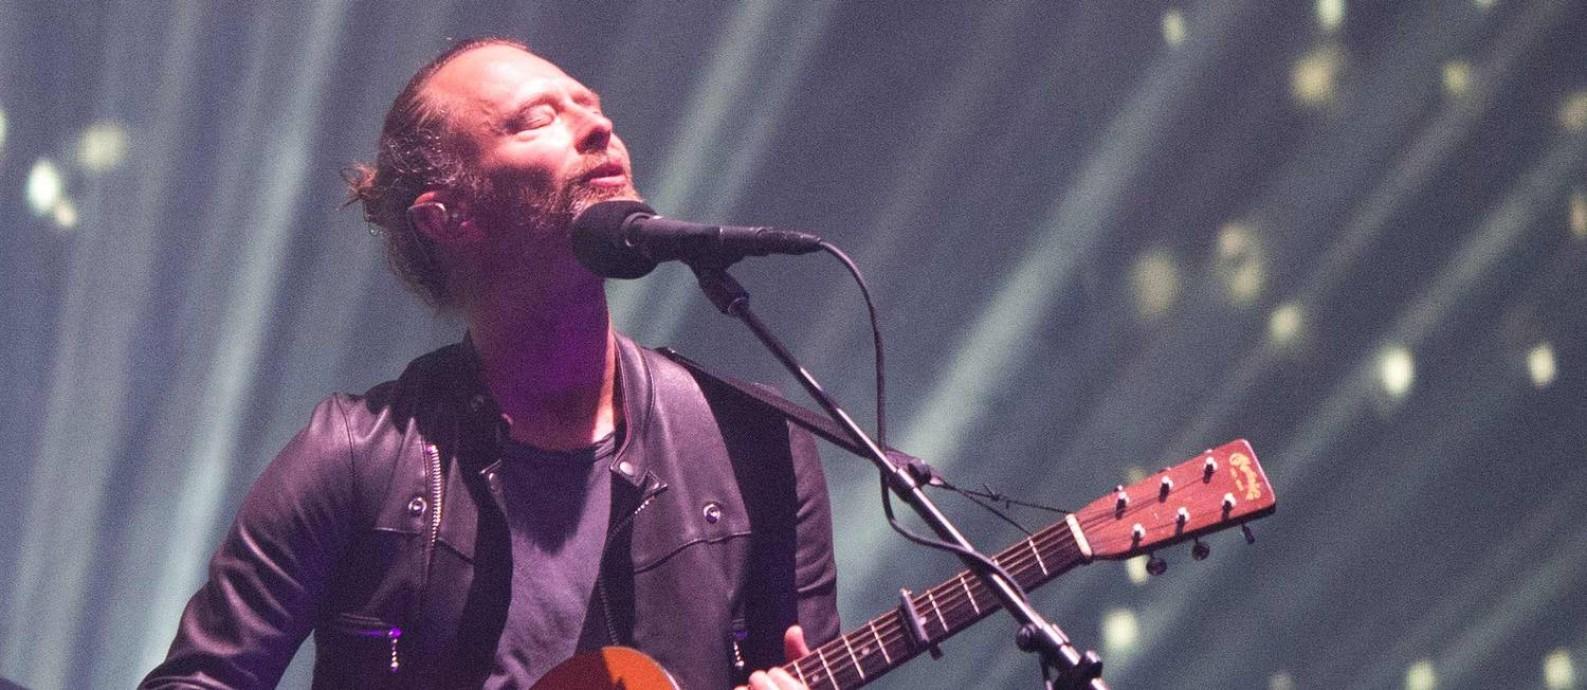 Radiohead se apresenta no Coachella deste ano, na Califórnia Foto: Valerie Macon / AFP